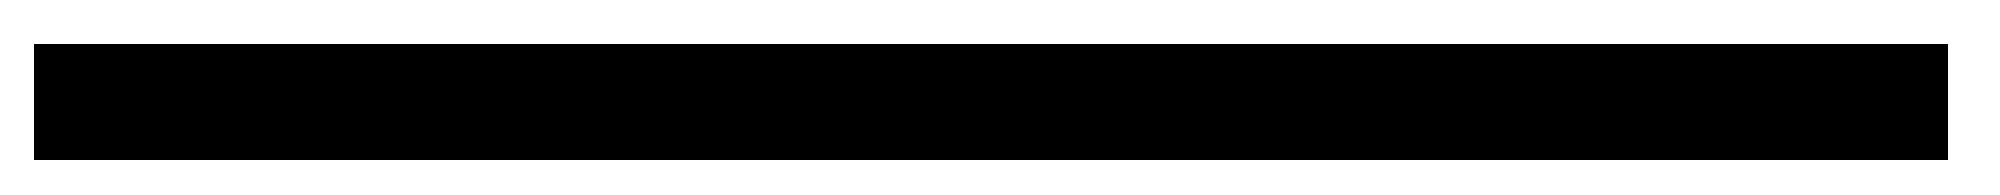 Marketing-services-Digital-marketing-services-Marketing-services-agencies-Marketing-services-lists-Marketing-services-for-small-business-Marketing-services-companies-Marketin-services-pricing-Full-service-digital-marketing-agency-Product-marketing-Service-marketing-Digital marketing-services-uk-online-marketing-services-uk-Digital-marketing-services-London-Digital-marketing-consultancy-services-Marketing-strategy-consultancy-services-Brand-marketing-Branding-and-Design-Web-design-Web-Development-Website-design-services-Website-design-proposal-Website-design-and-management-services-Website-design-services-Website-and-management-services-Website-design-and-marketing-services-Website-design-for-professional-services-Marketing-consultancy-services-Marketing-Consultancy-Marketing-Consultancy-services-Marketing-Consultancy-agency-Marketing-Consultancy-pricing-Marketing-Consultancy-uk-Marketing-Consultancy-company-Social-media-Influencer-Marketing-Social-media-services-Social-media-packages-Social-media-pricing-Social-media-services-proposal